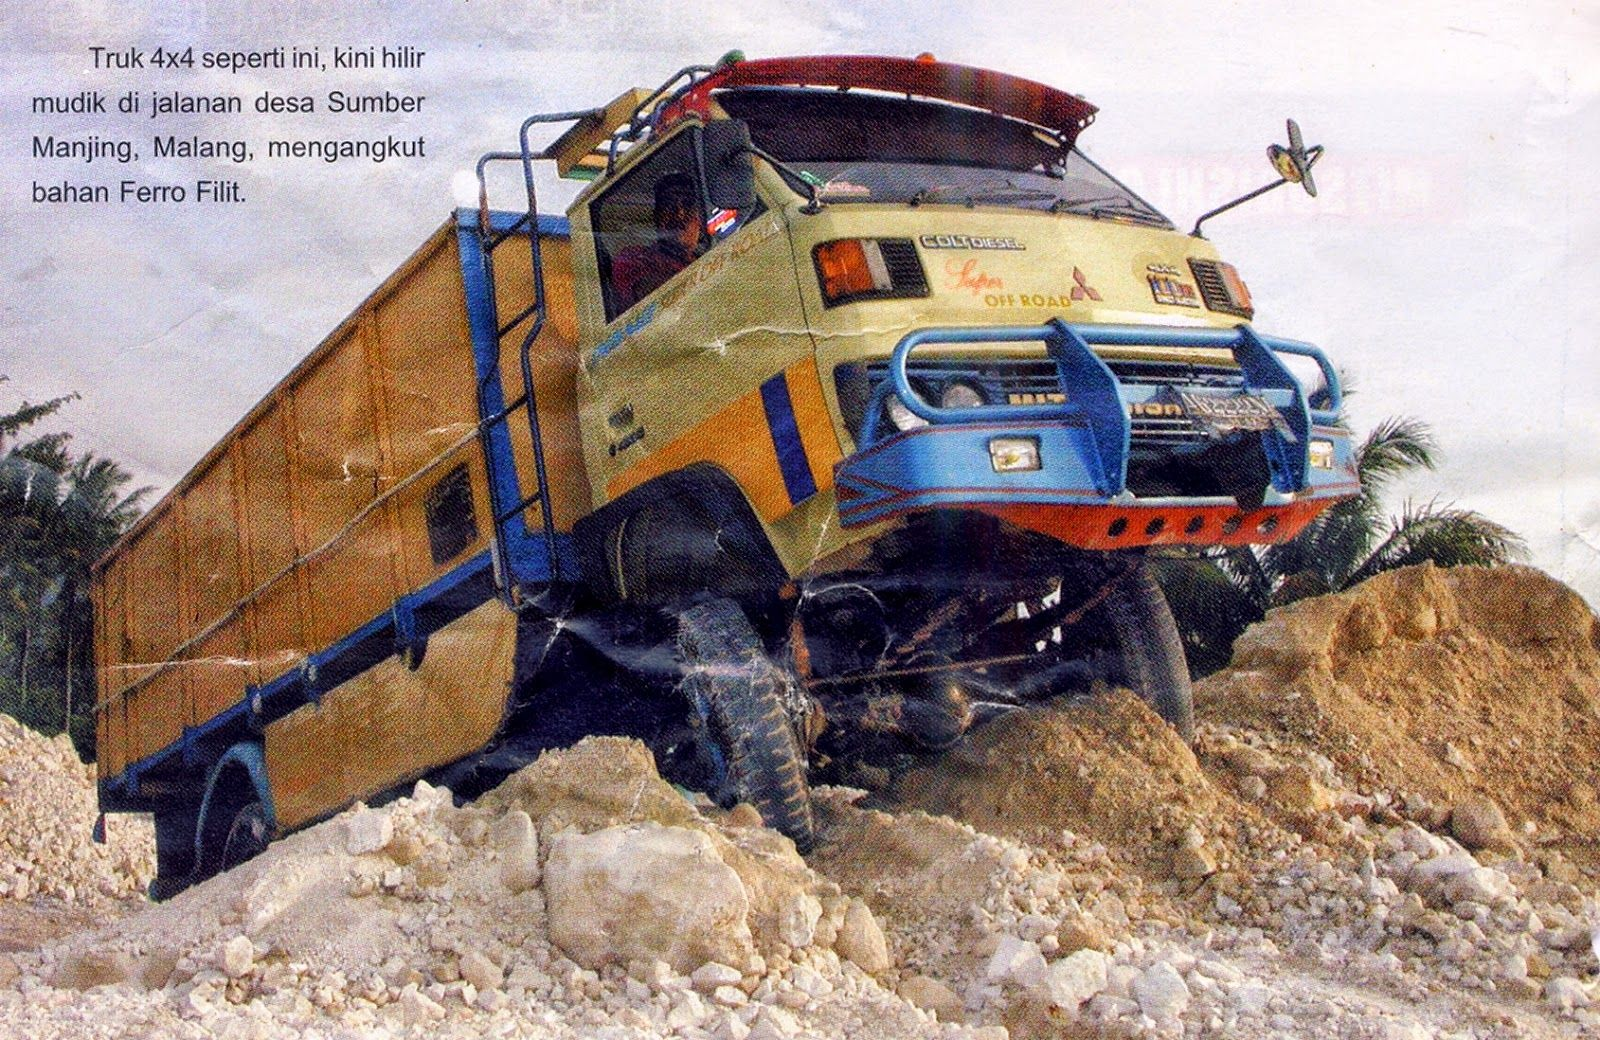 Modifikasi truck mitsubishi colt diesel dan canter 4wd foto truck